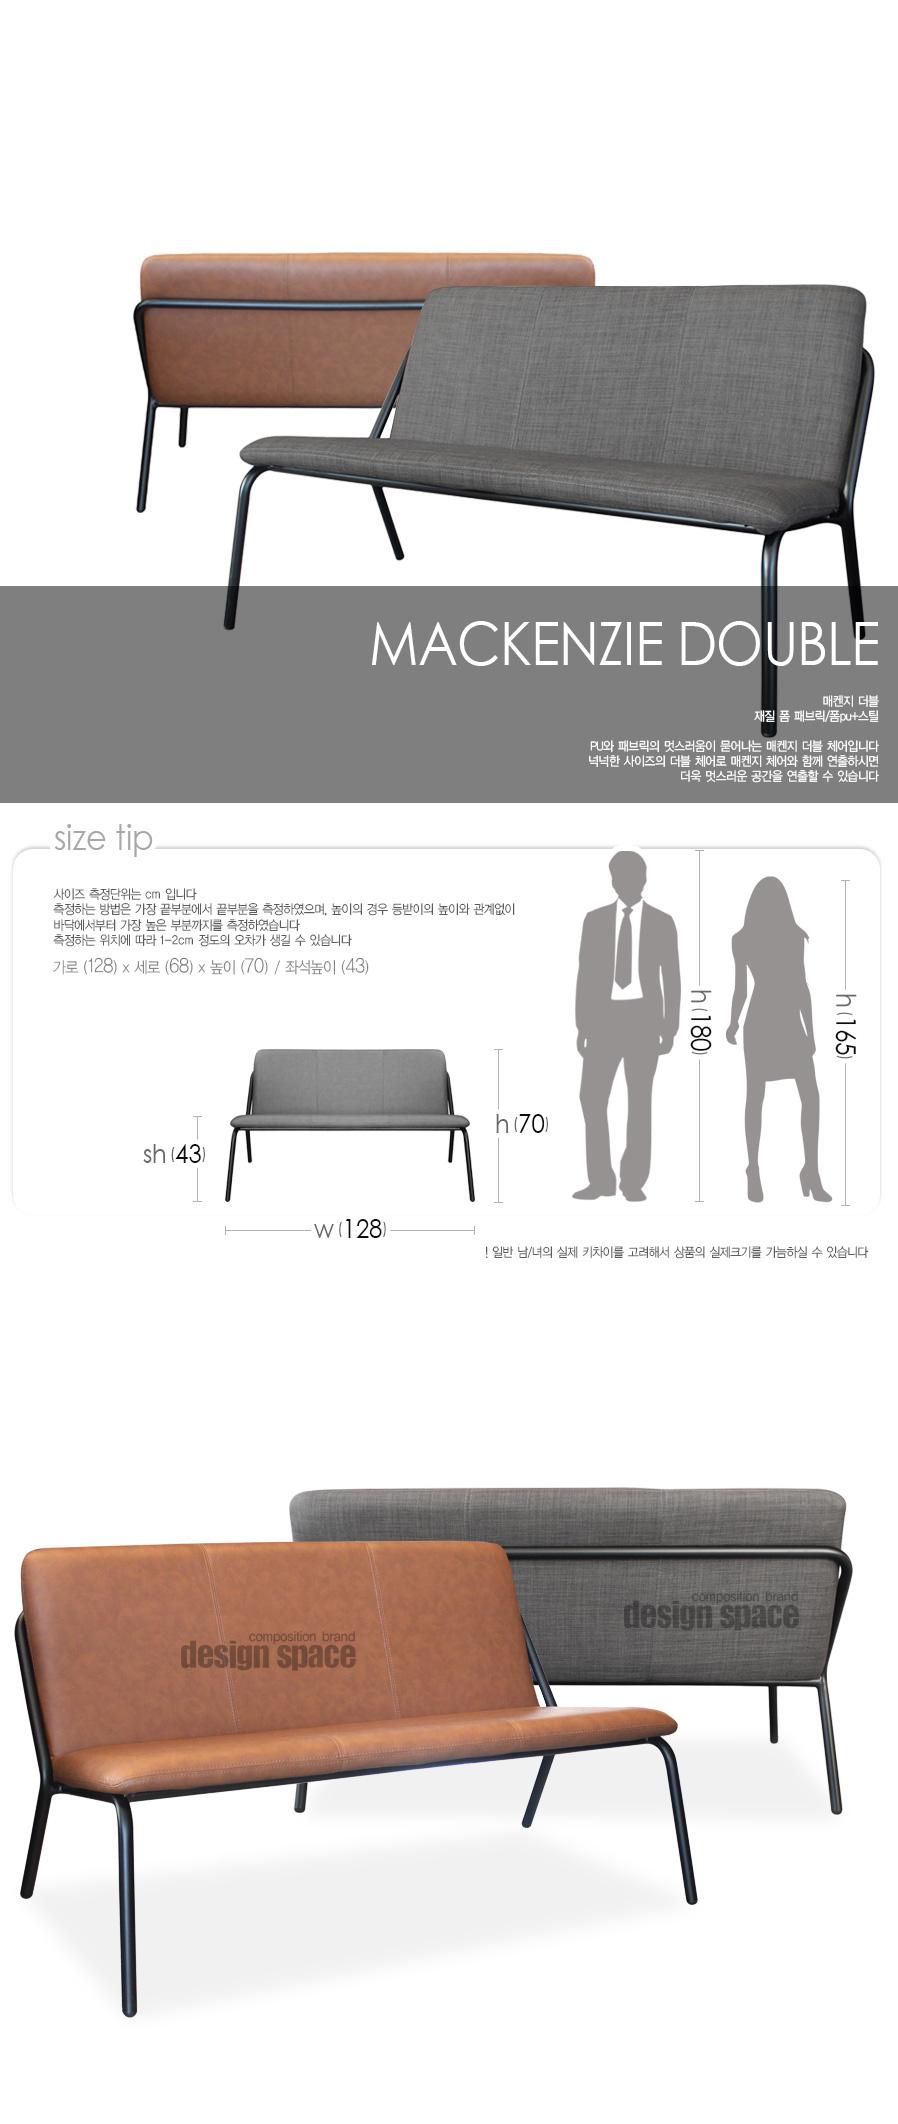 mackenzie-double-chair_01.jpg